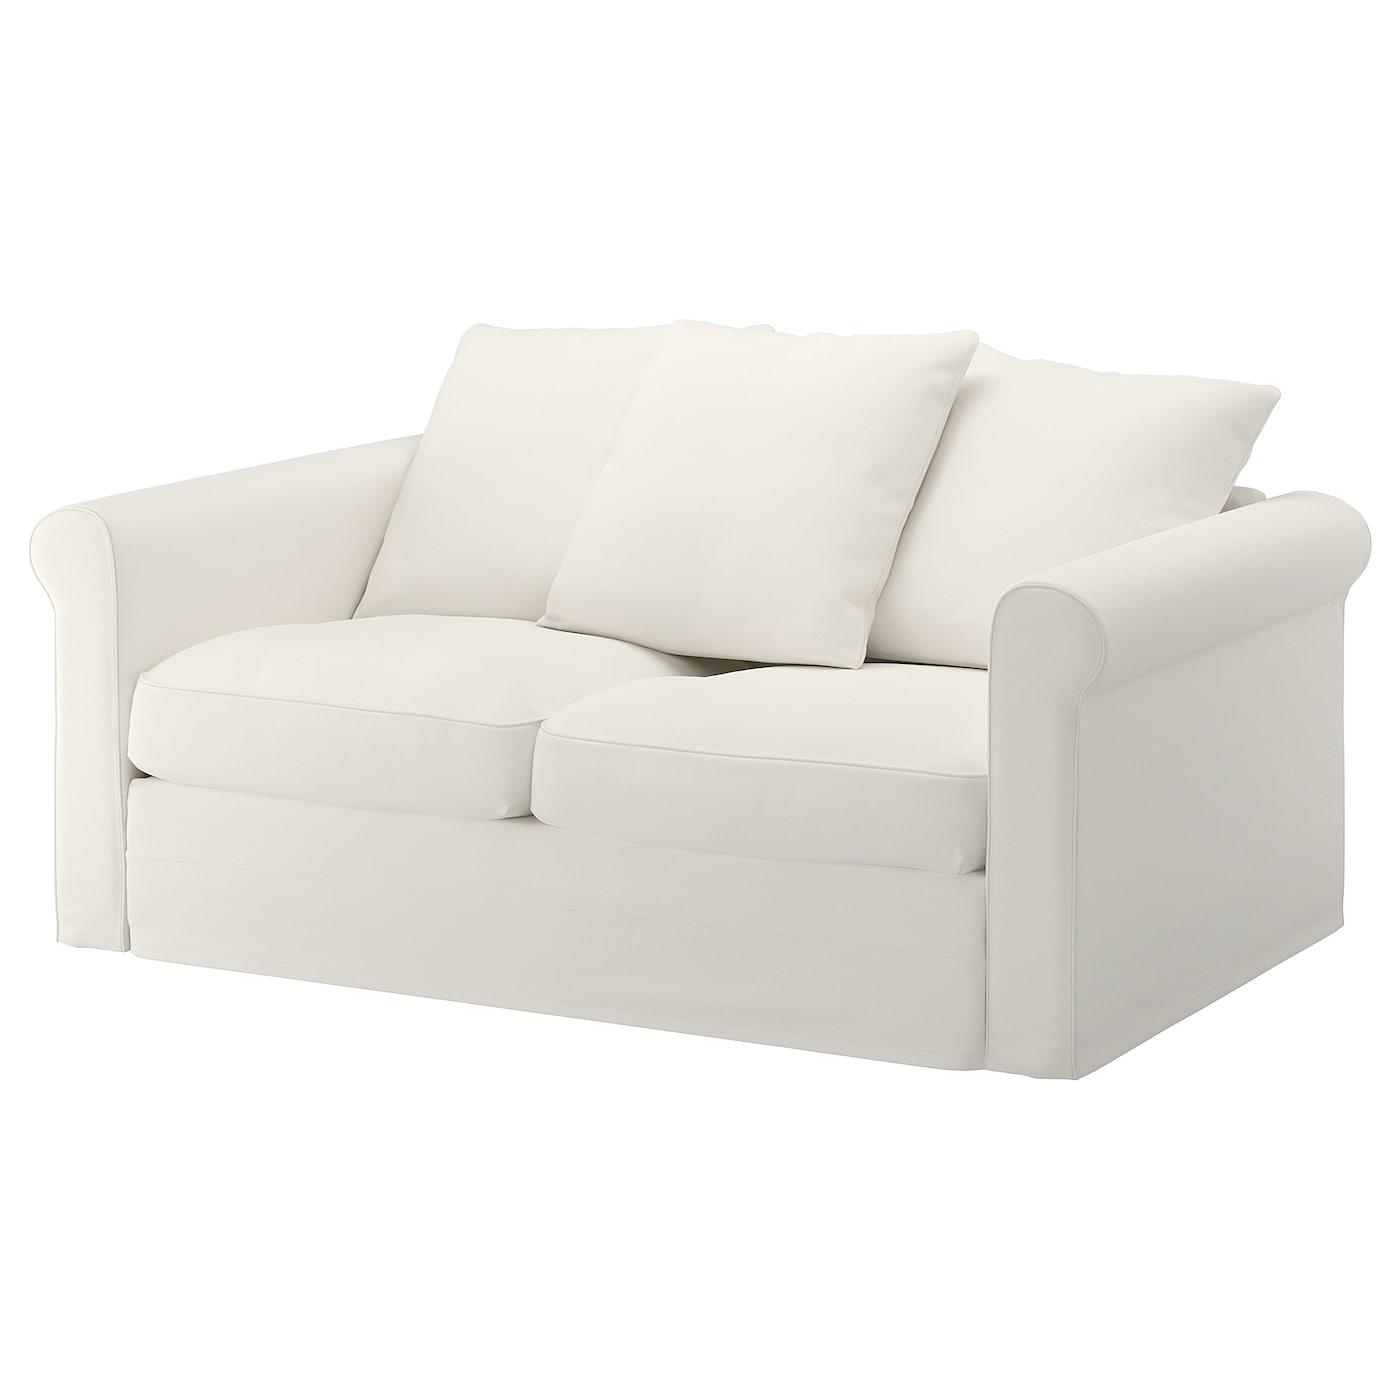 Ikea GrÖnlid Cover For 2 Seat Sofa